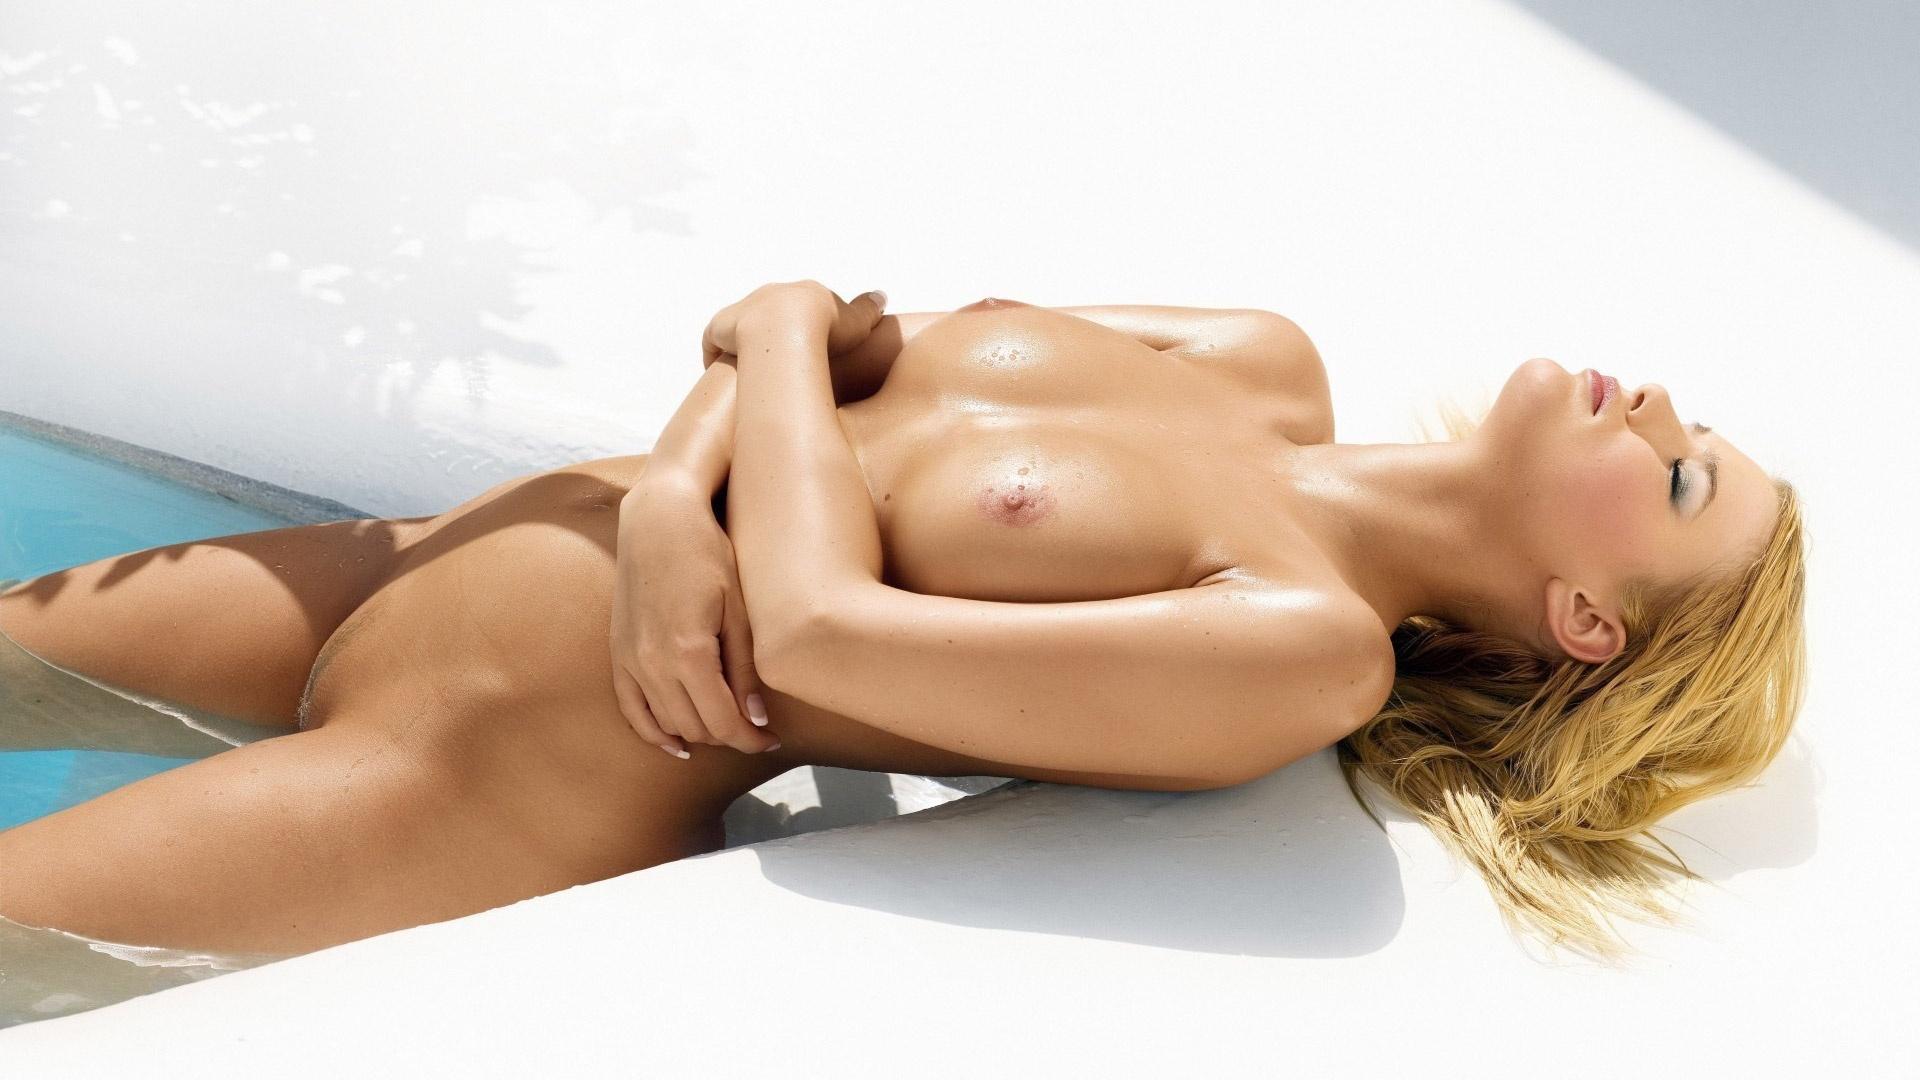 Chantal Hansen hot nude blonde wet at the pool exposing ...